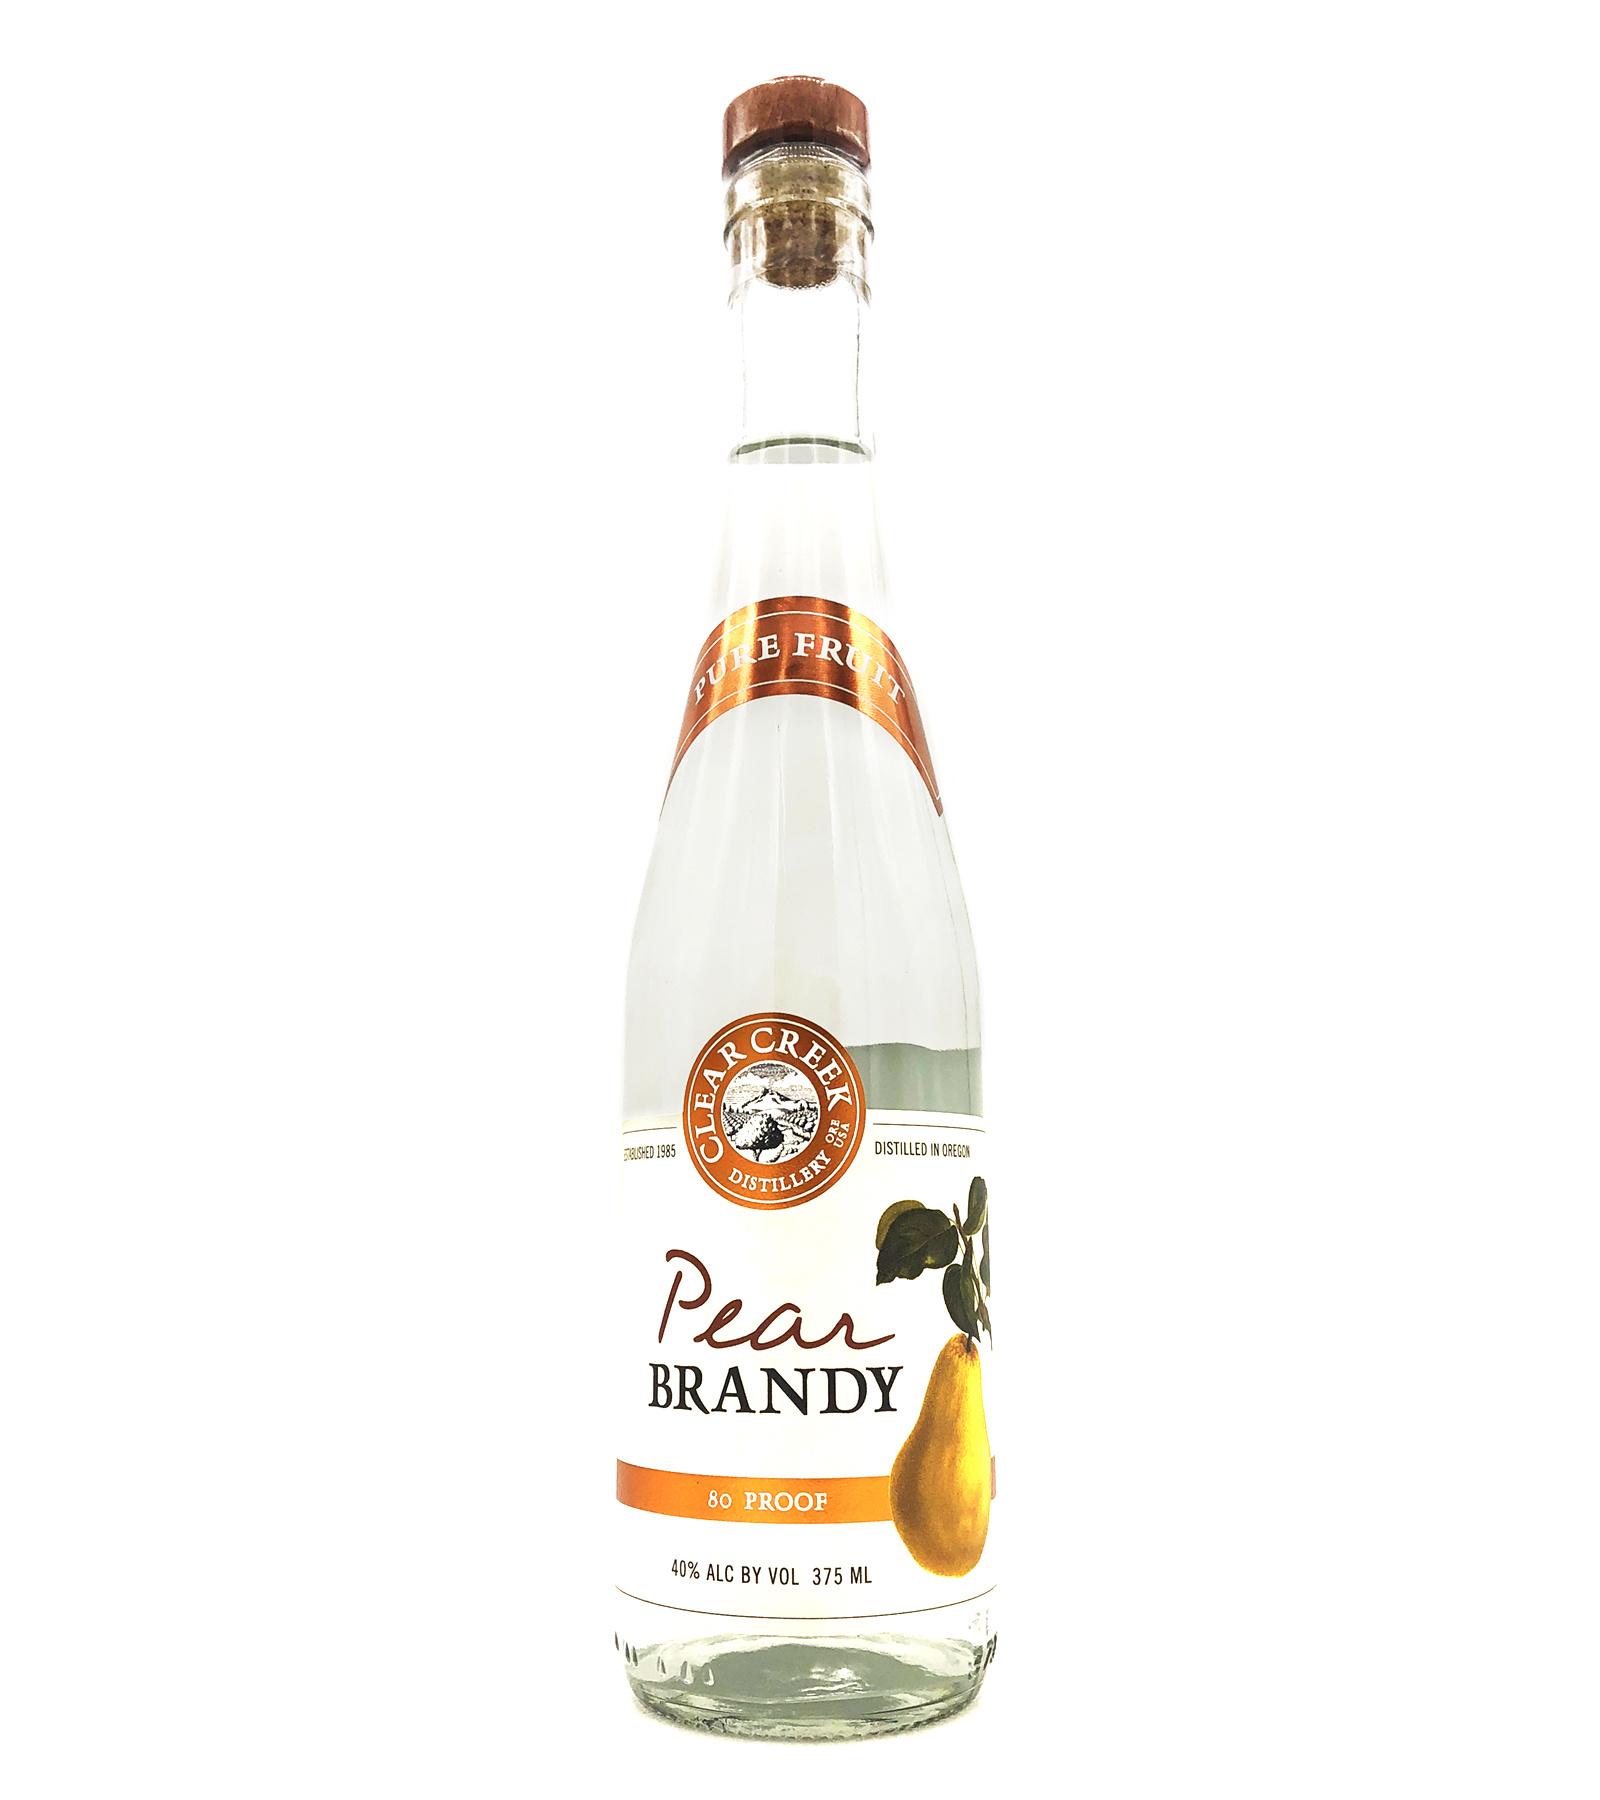 Pear Brandy 375ml Clear Creek Distillery